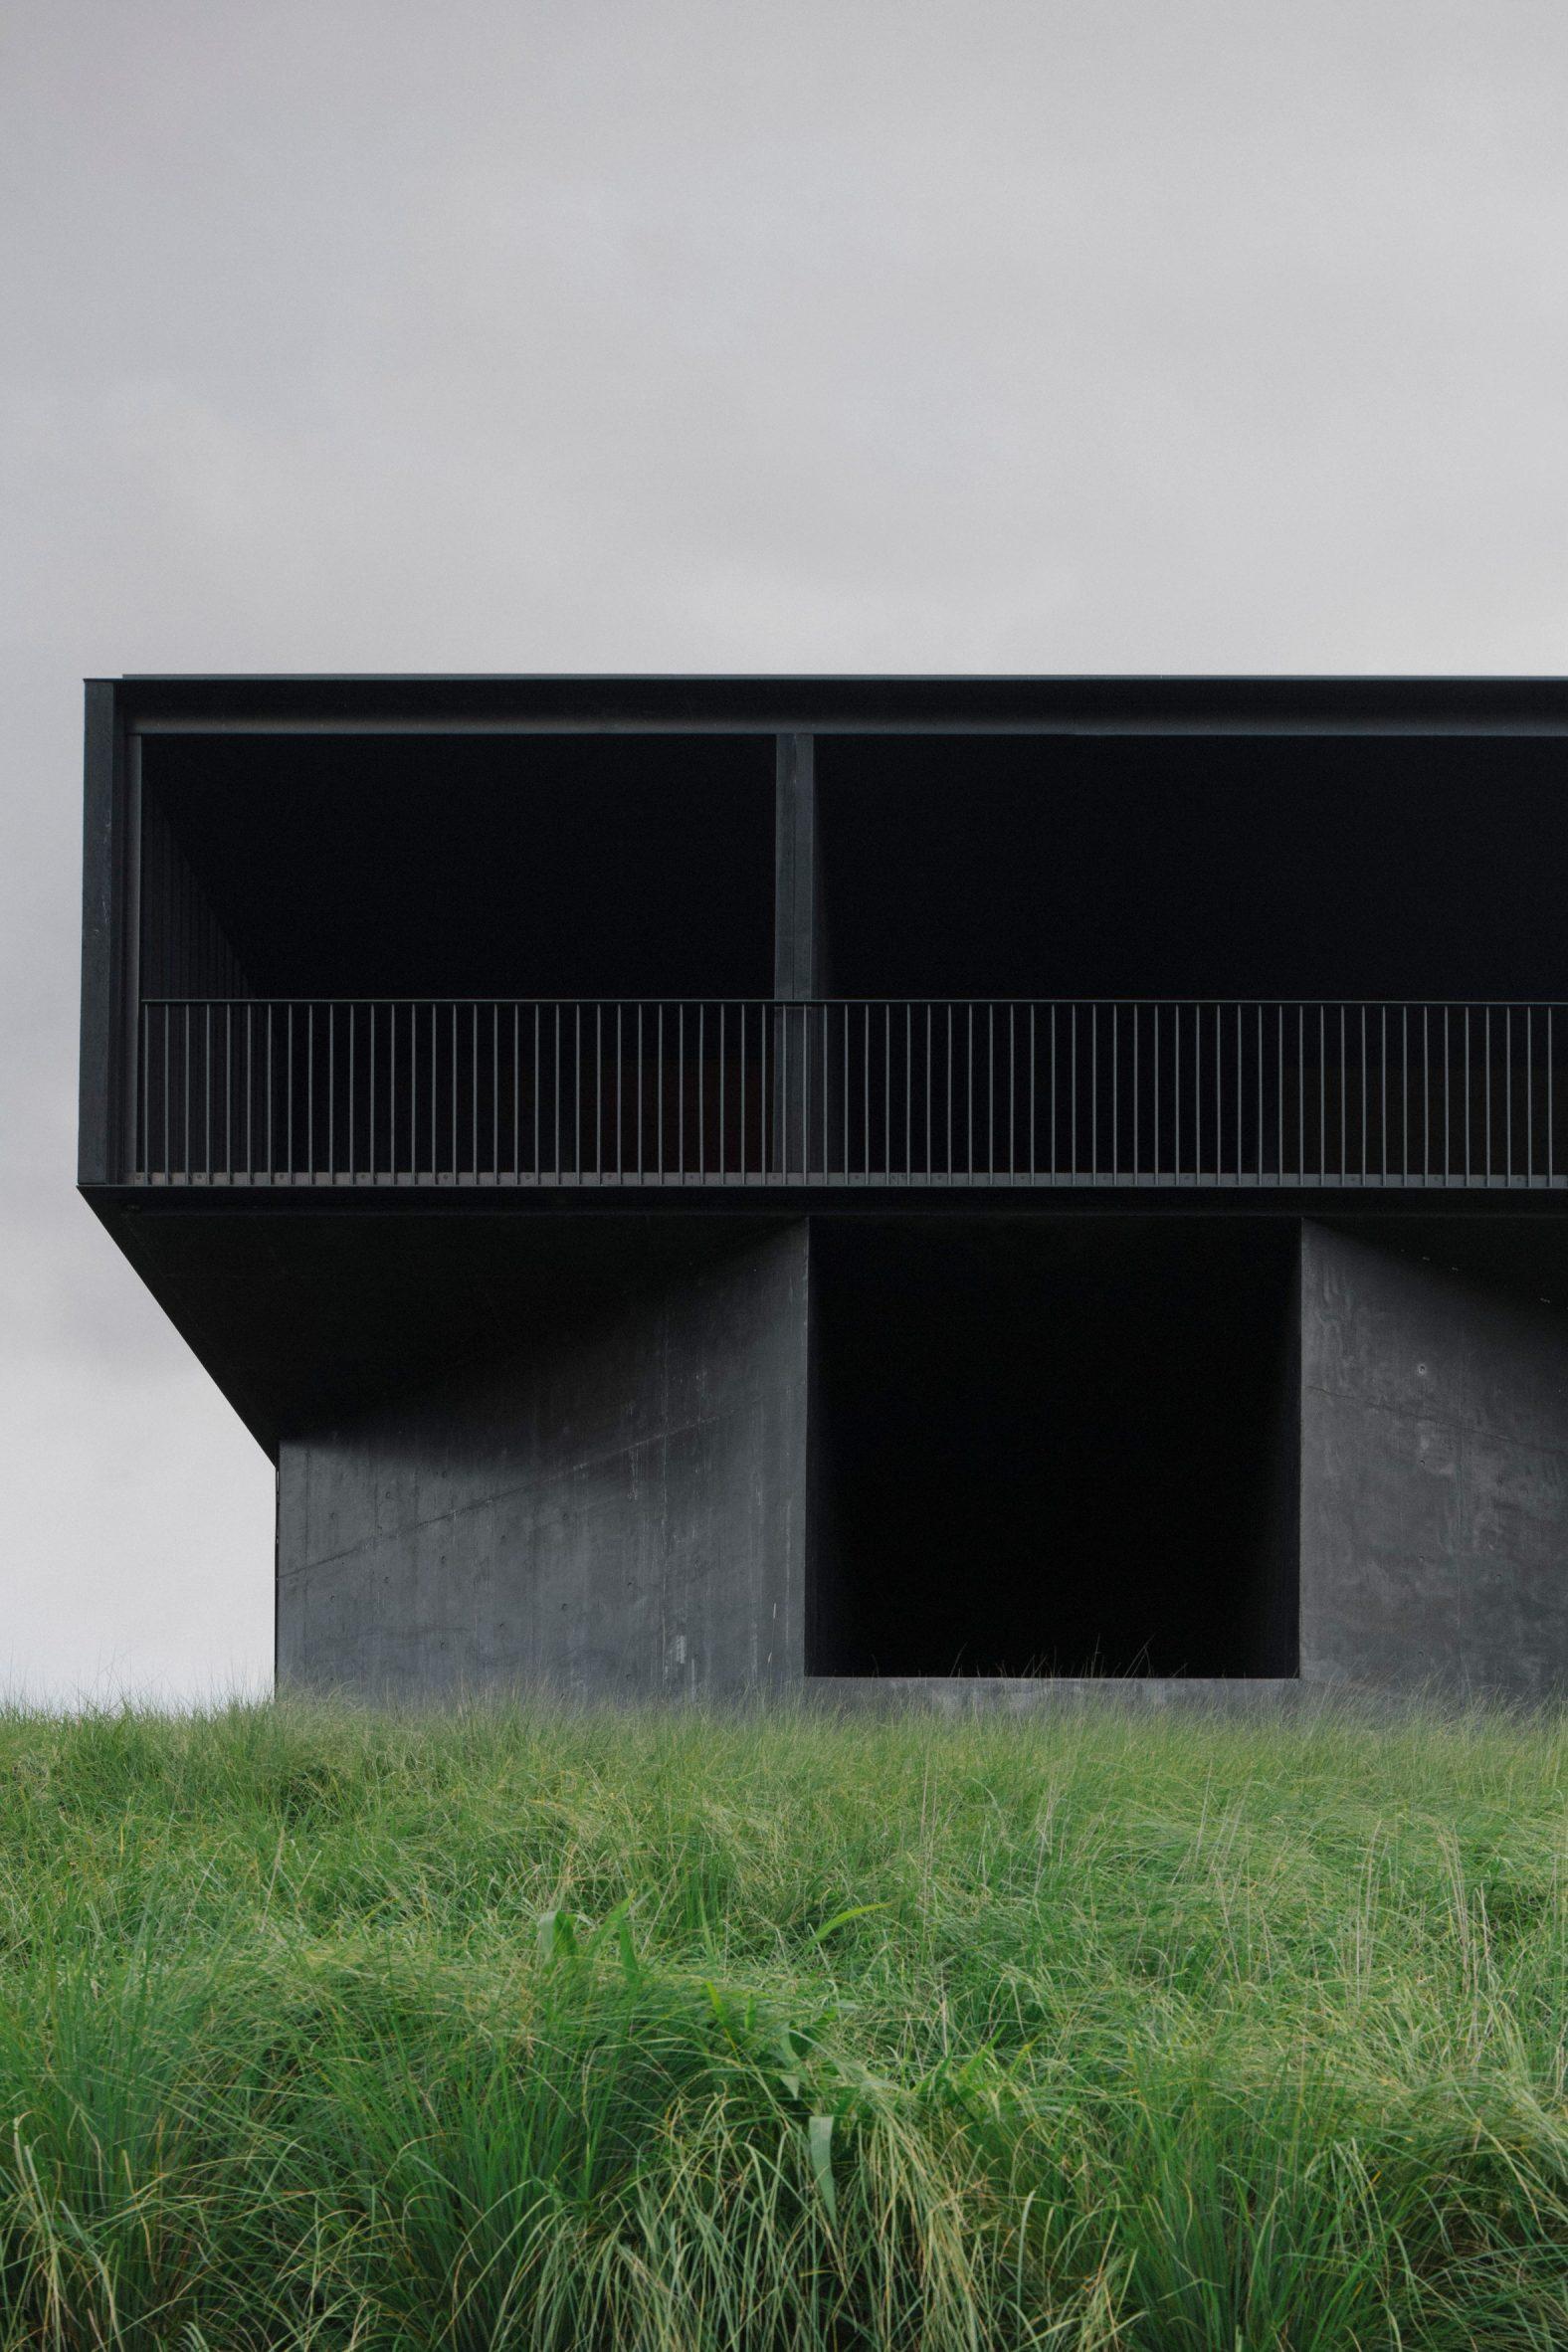 A black concrete house